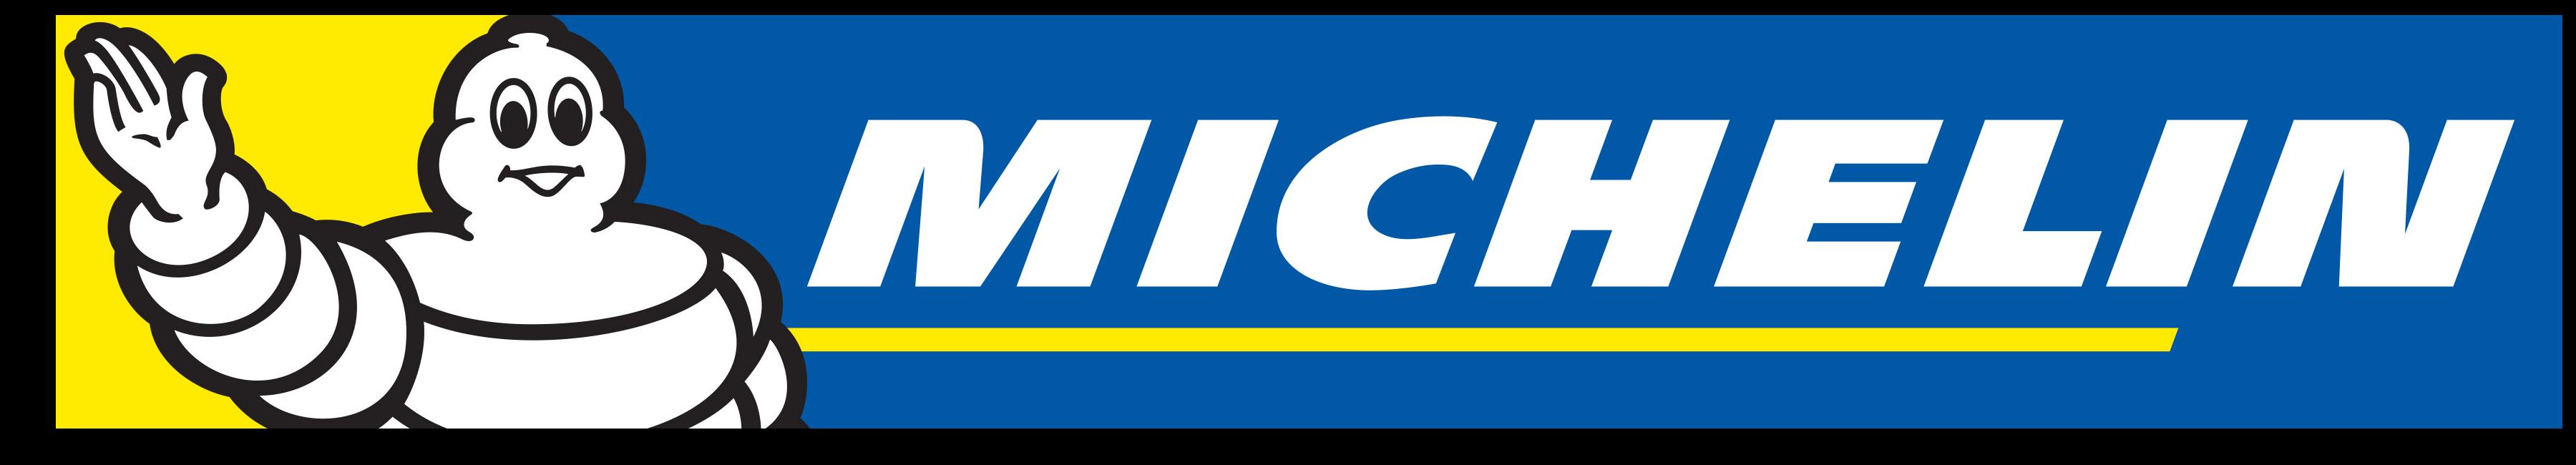 Michelin-logo-4000x1000